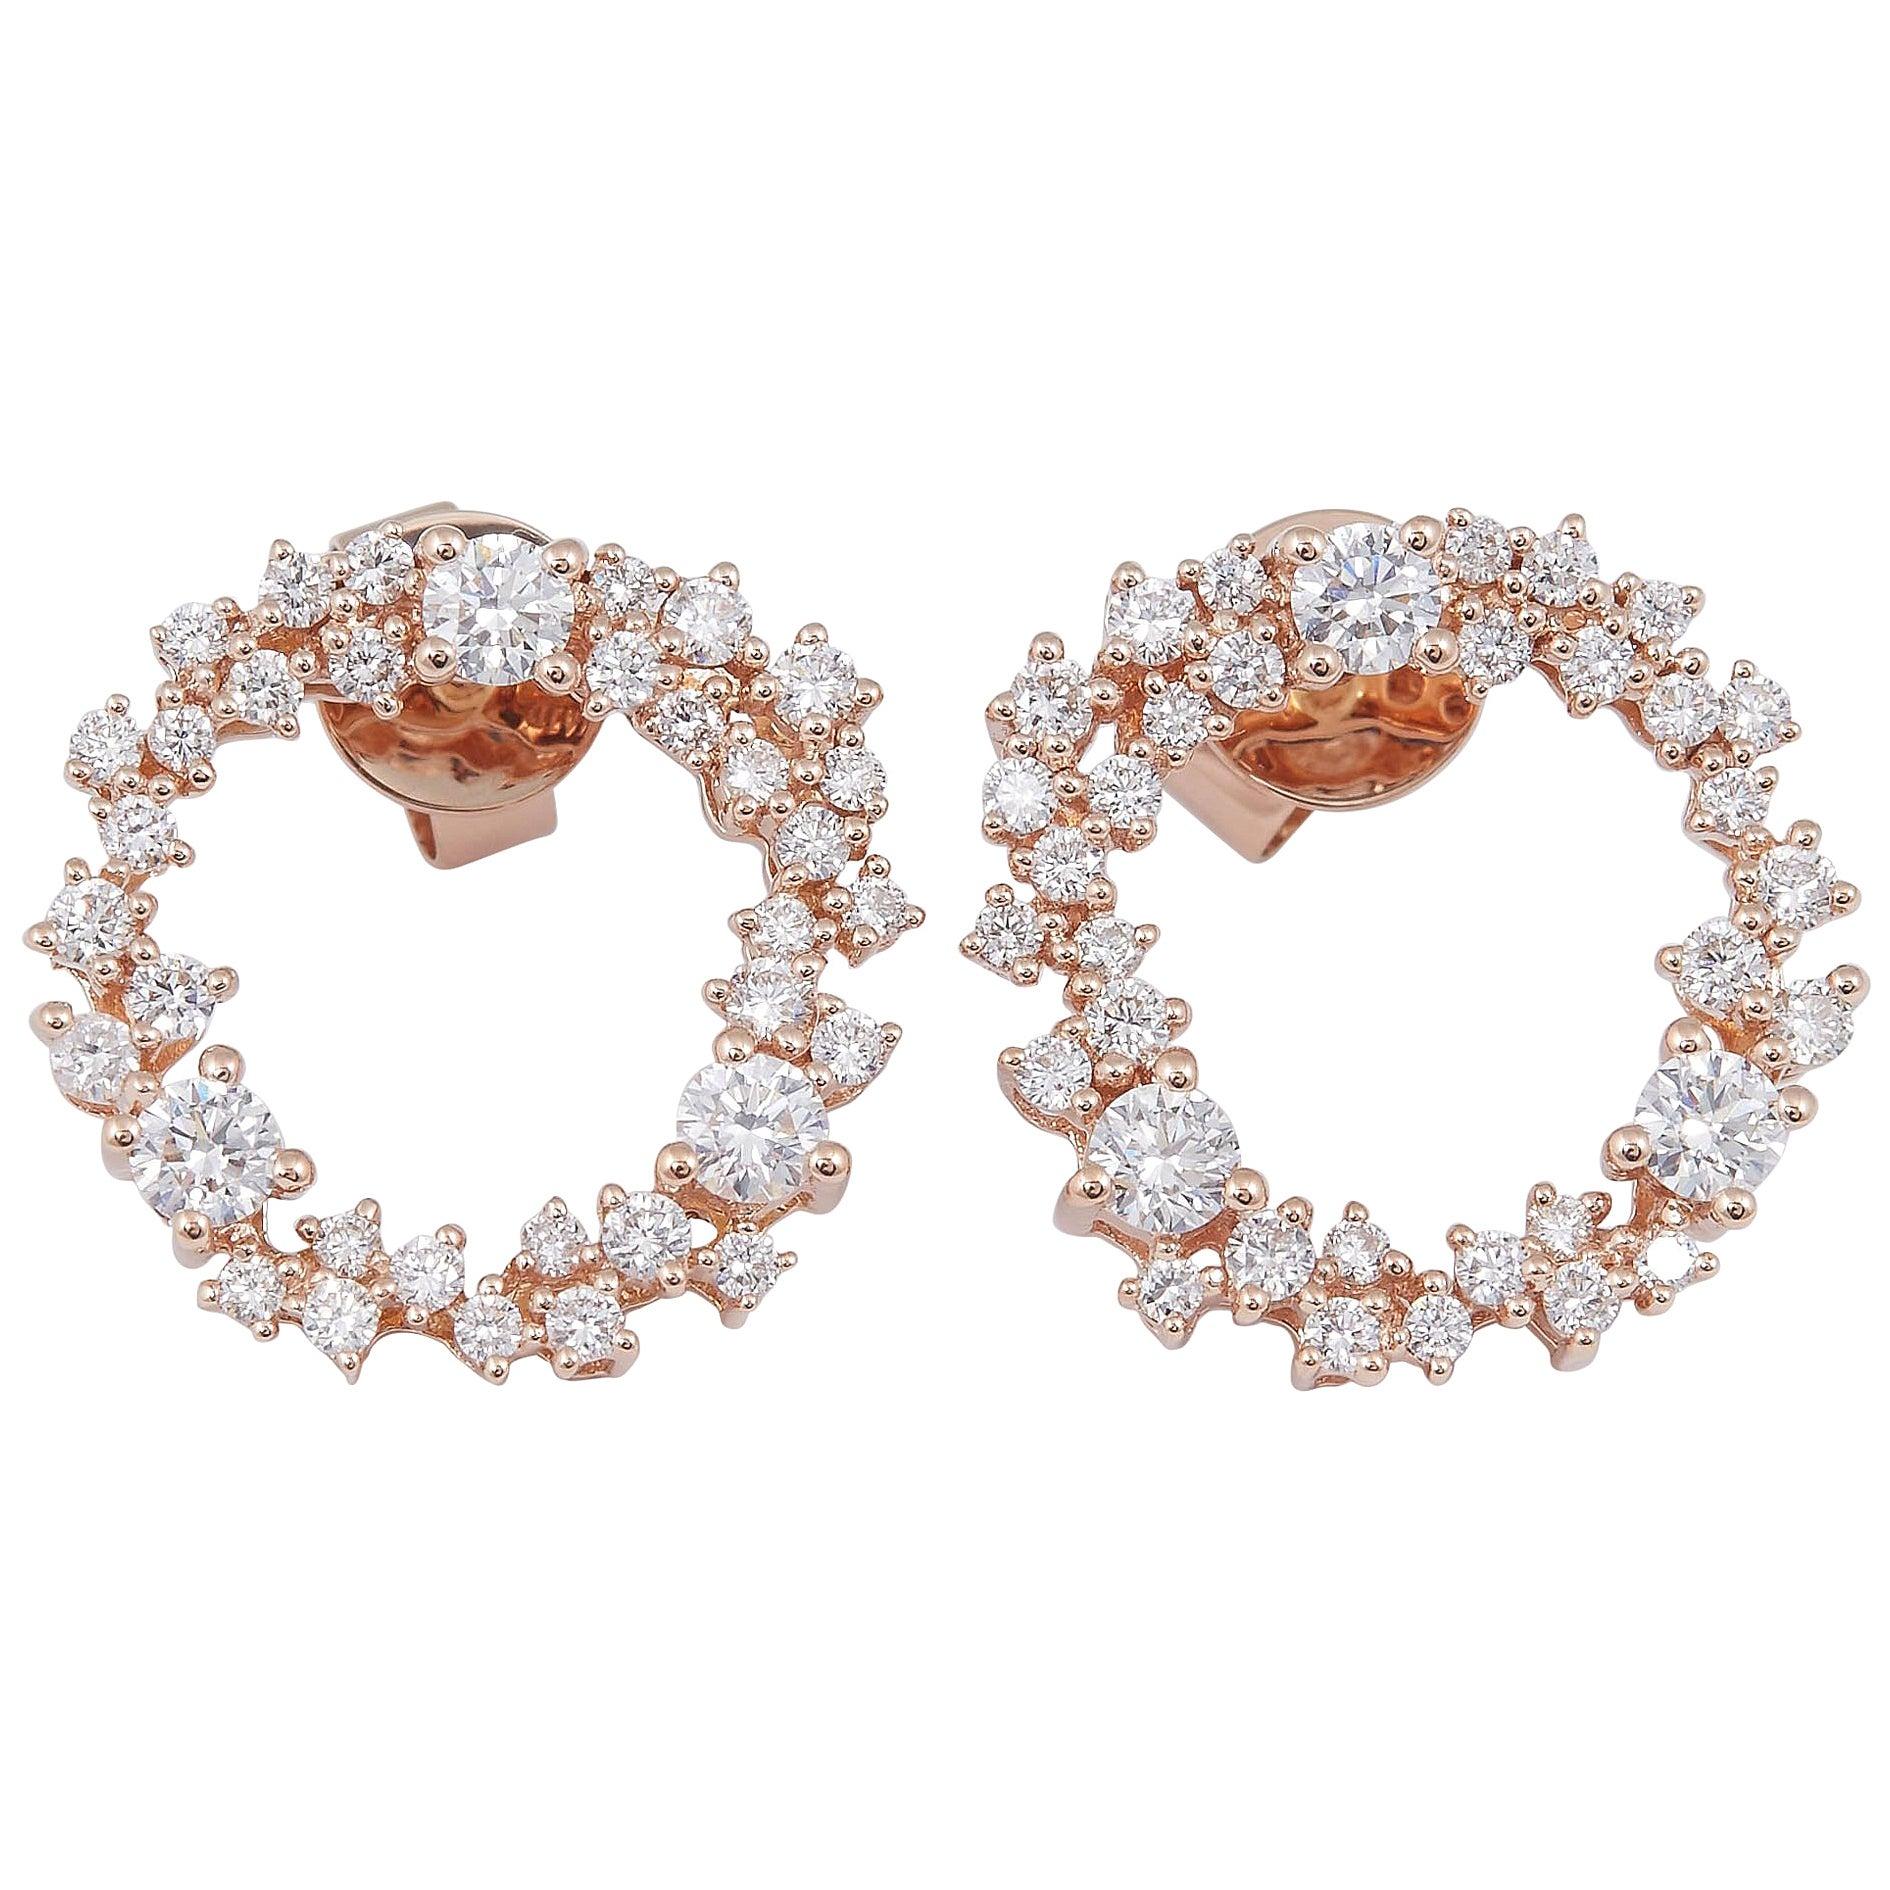 HARBOR D. Diamond Hoop Stud Earrings 1.34 Carats 18K Rose Gold